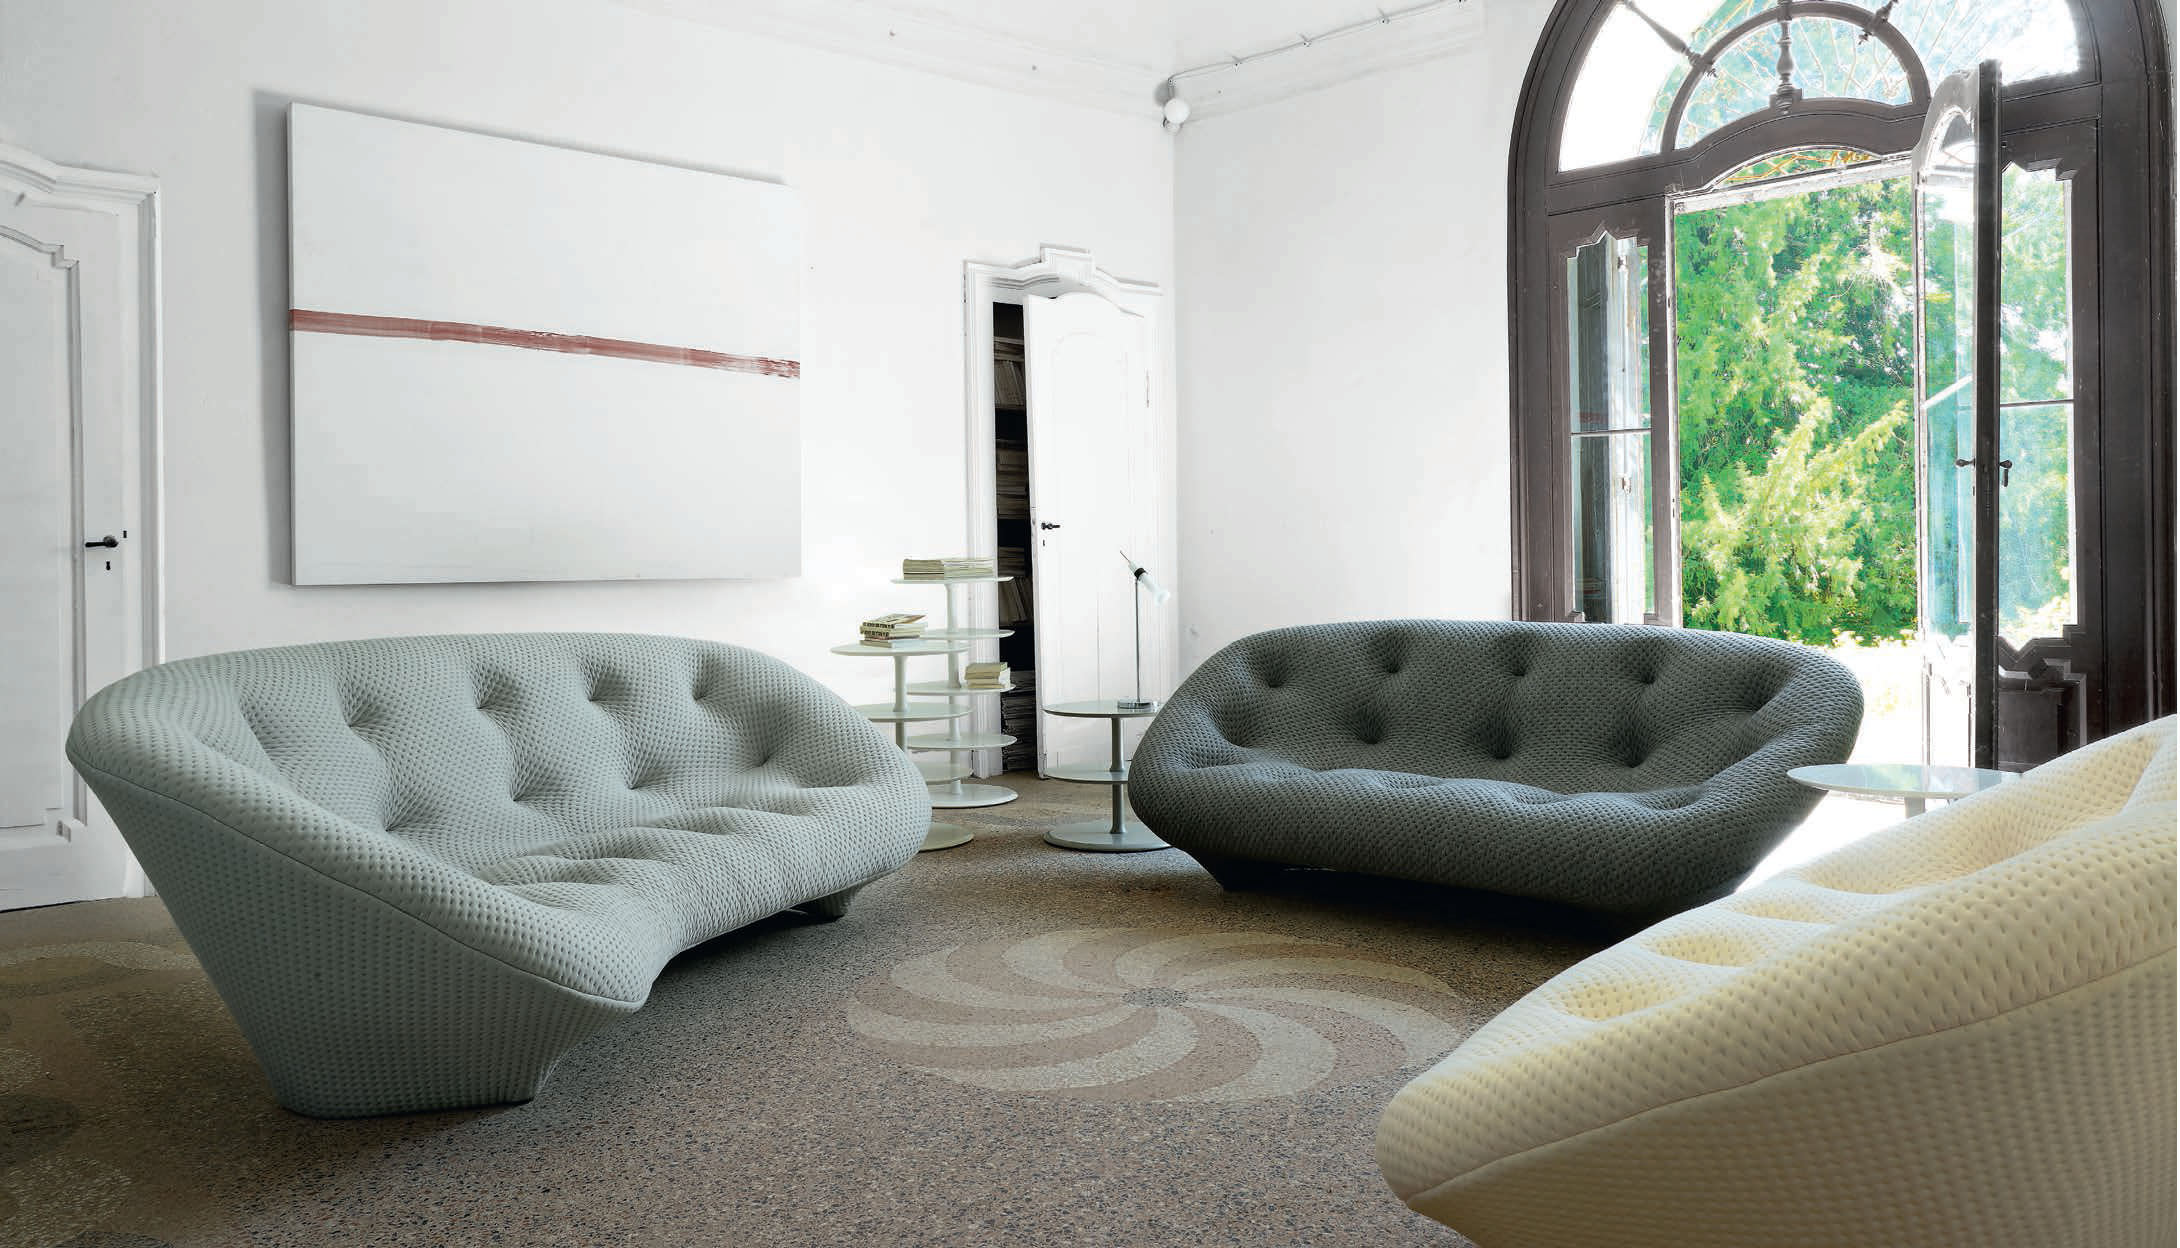 Canapé Contemporain En Tissu Par Ronan Erwan Bouroullec - Canapé tissu contemporain